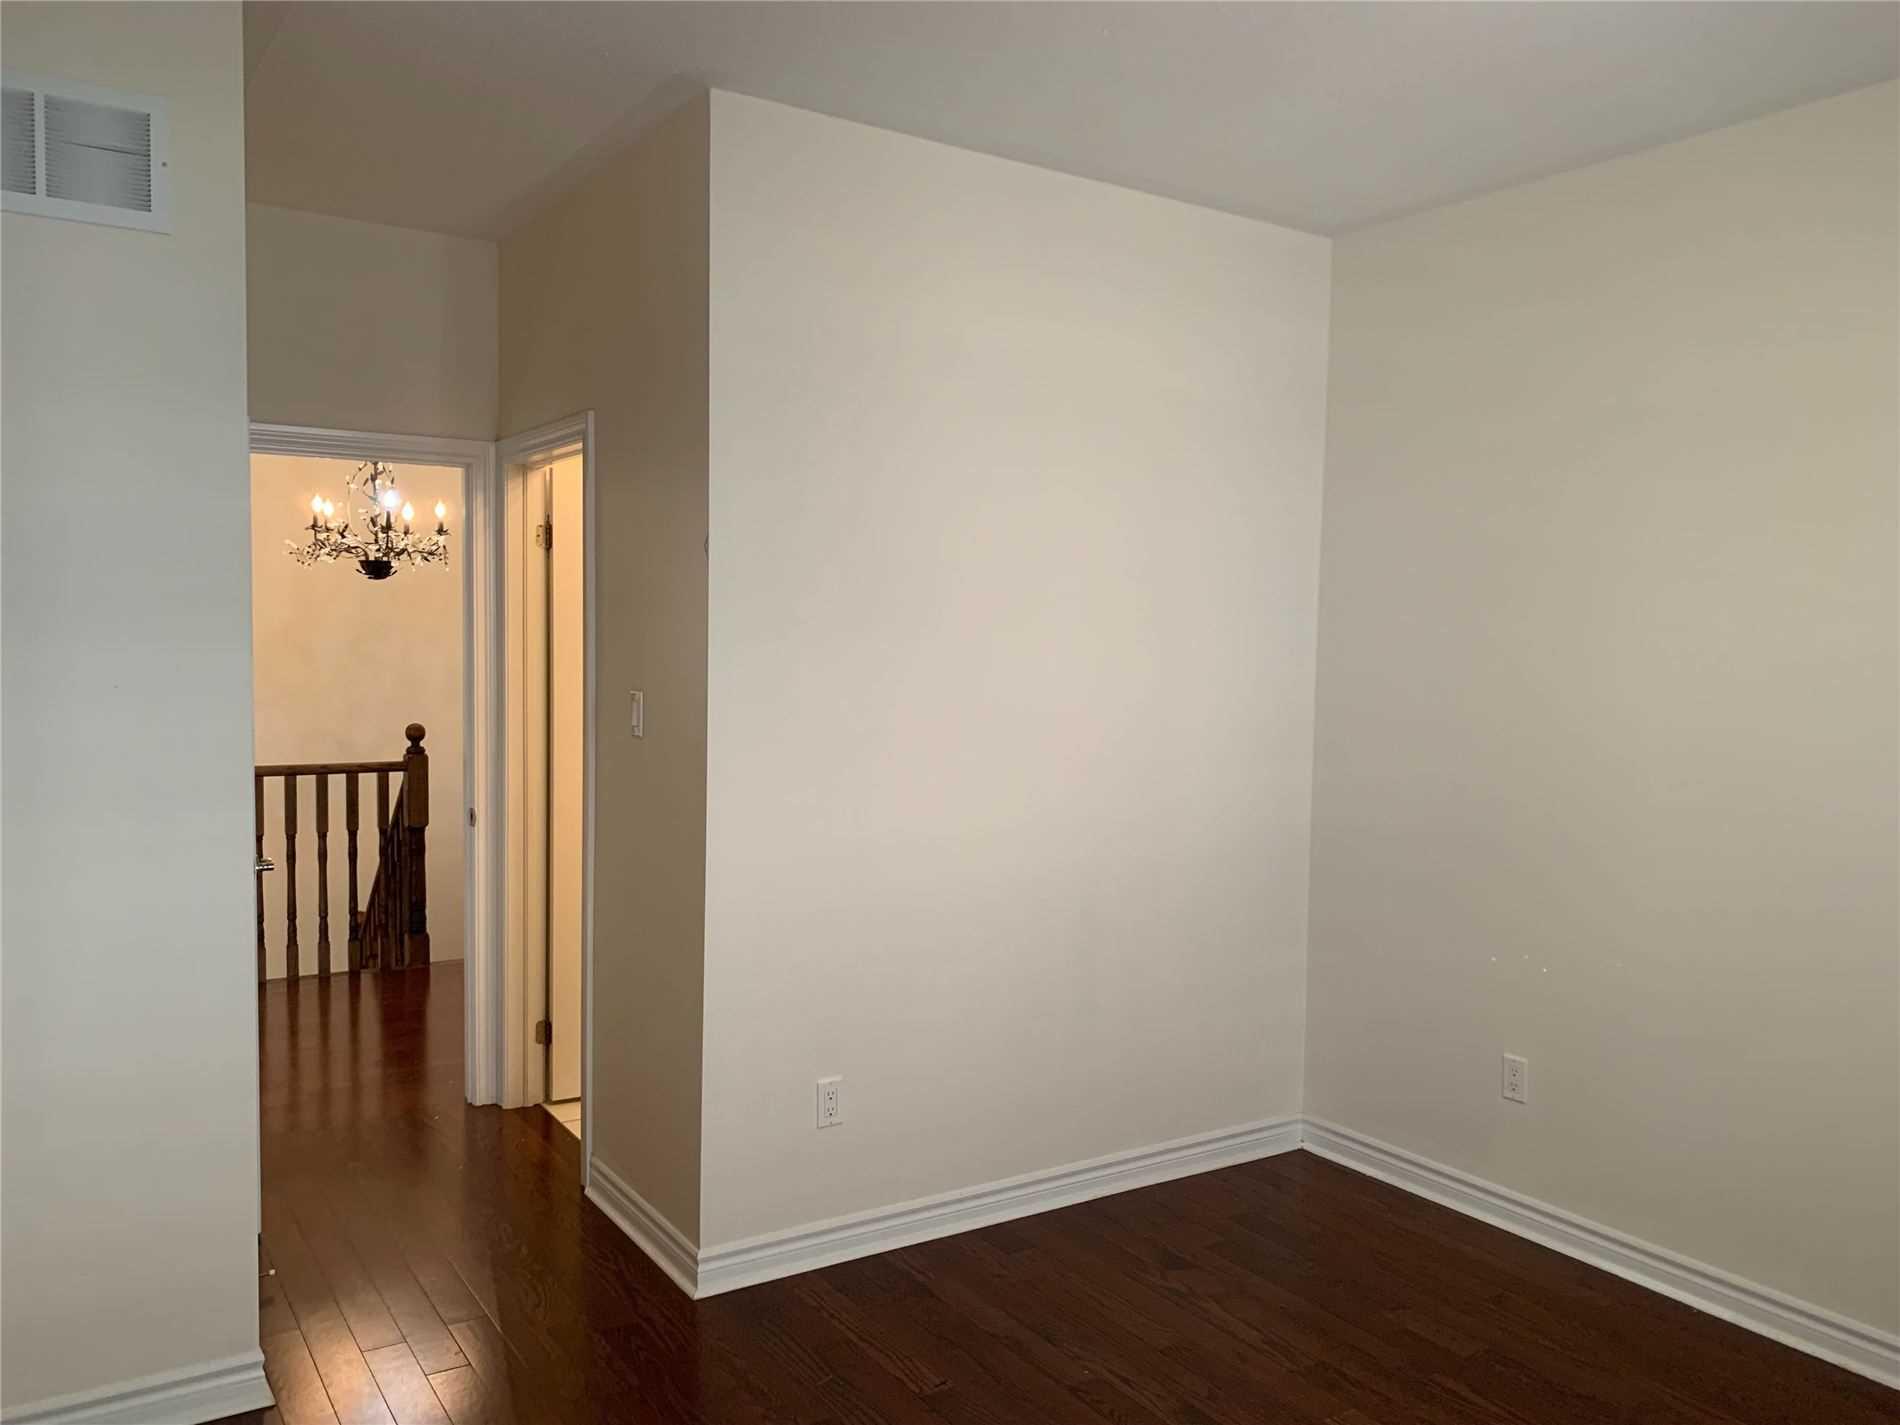 Detached house For Lease In Brampton - 60 Agincourt Circ, Brampton, Ontario, Canada L6X 2M4 , 4 Bedrooms Bedrooms, ,4 BathroomsBathrooms,Detached,For Lease,Upper,Agincourt